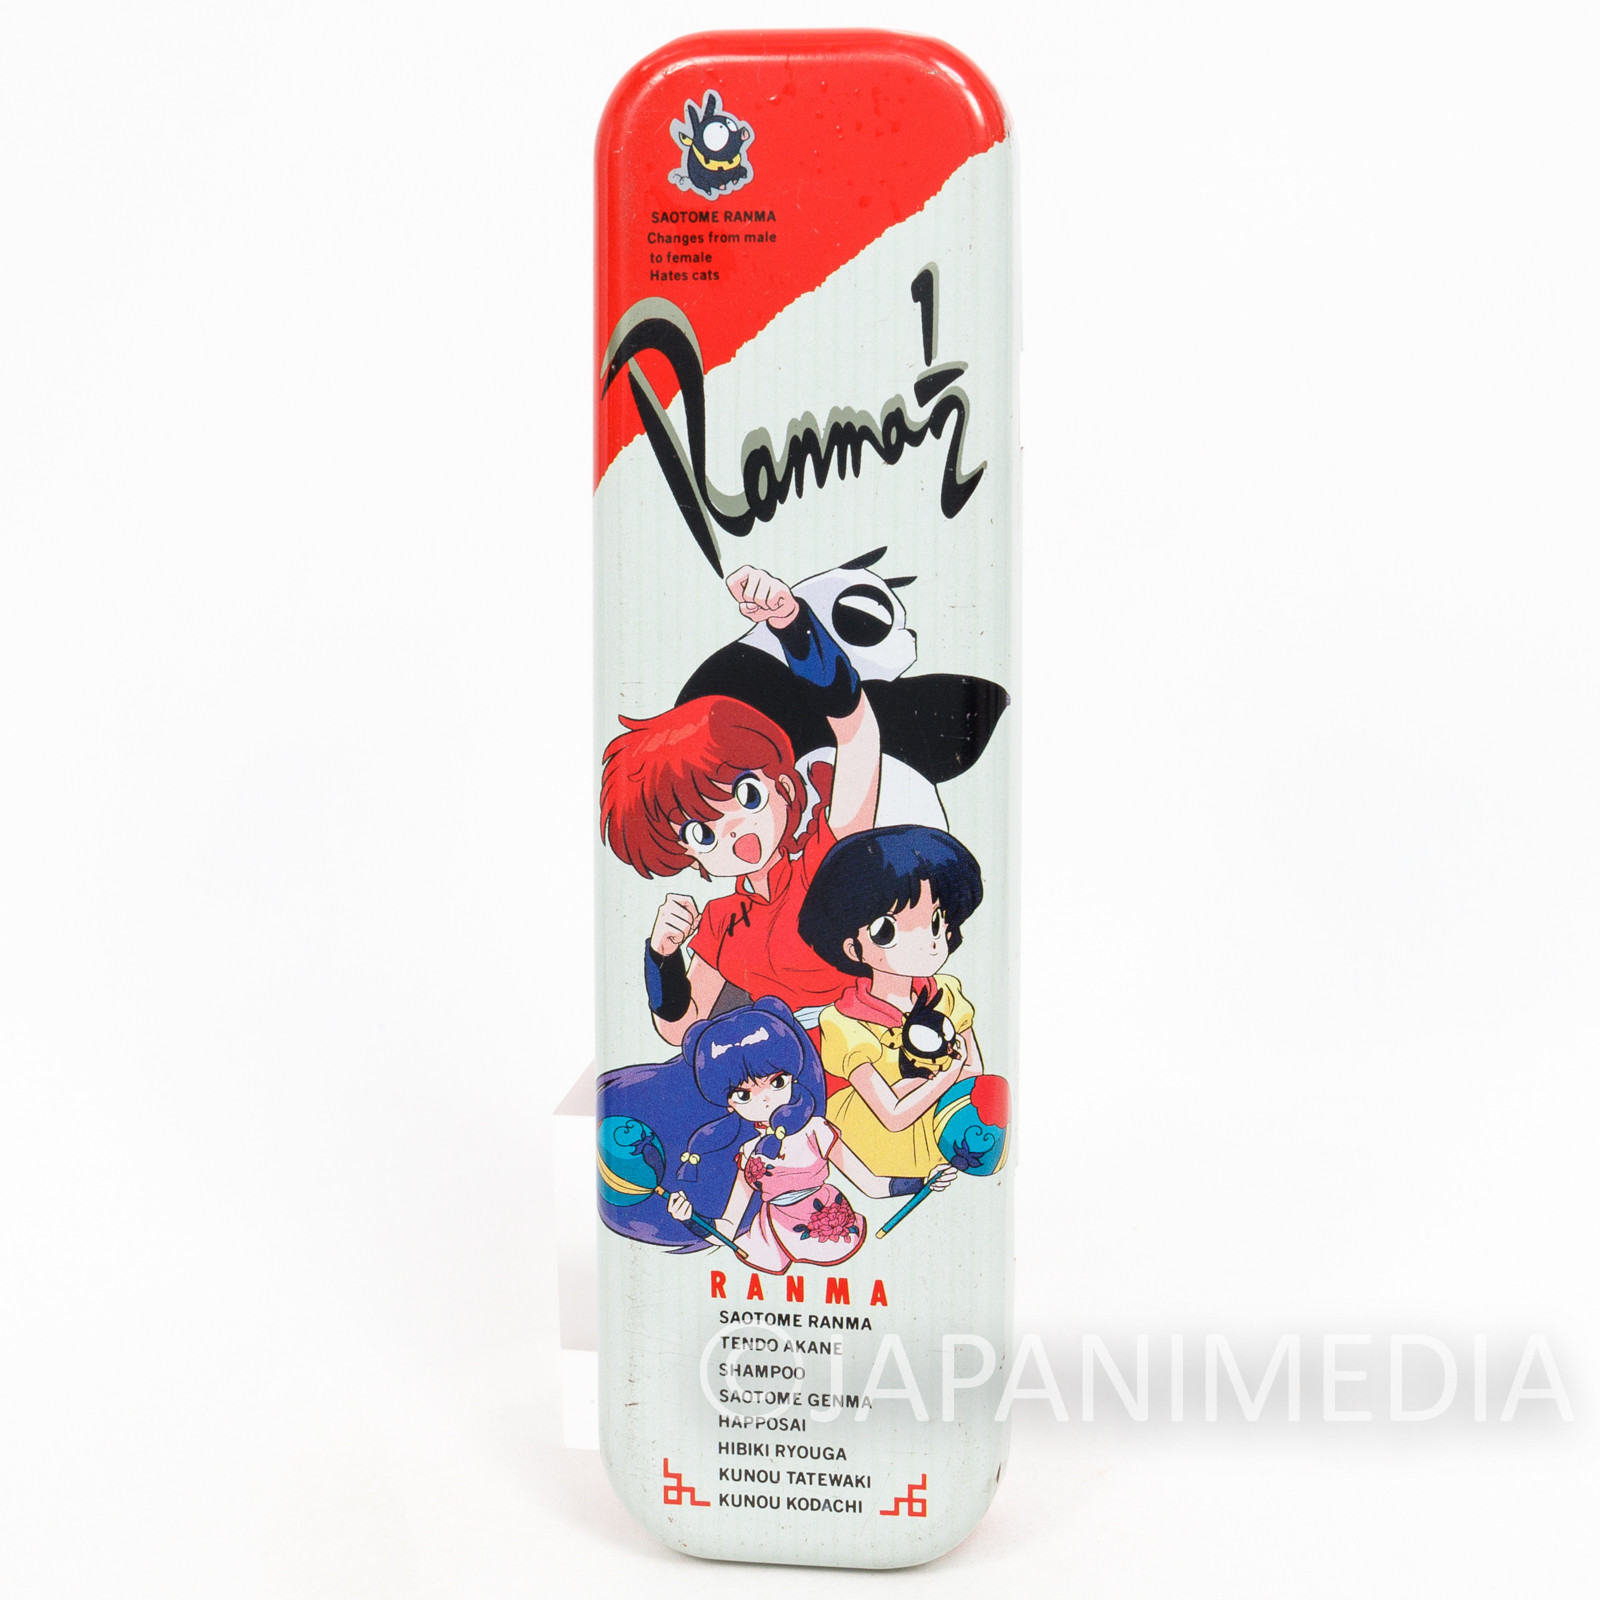 Ranma 1/2 Can Pen Case SEIKA JAPAN ANIME MANGA 3